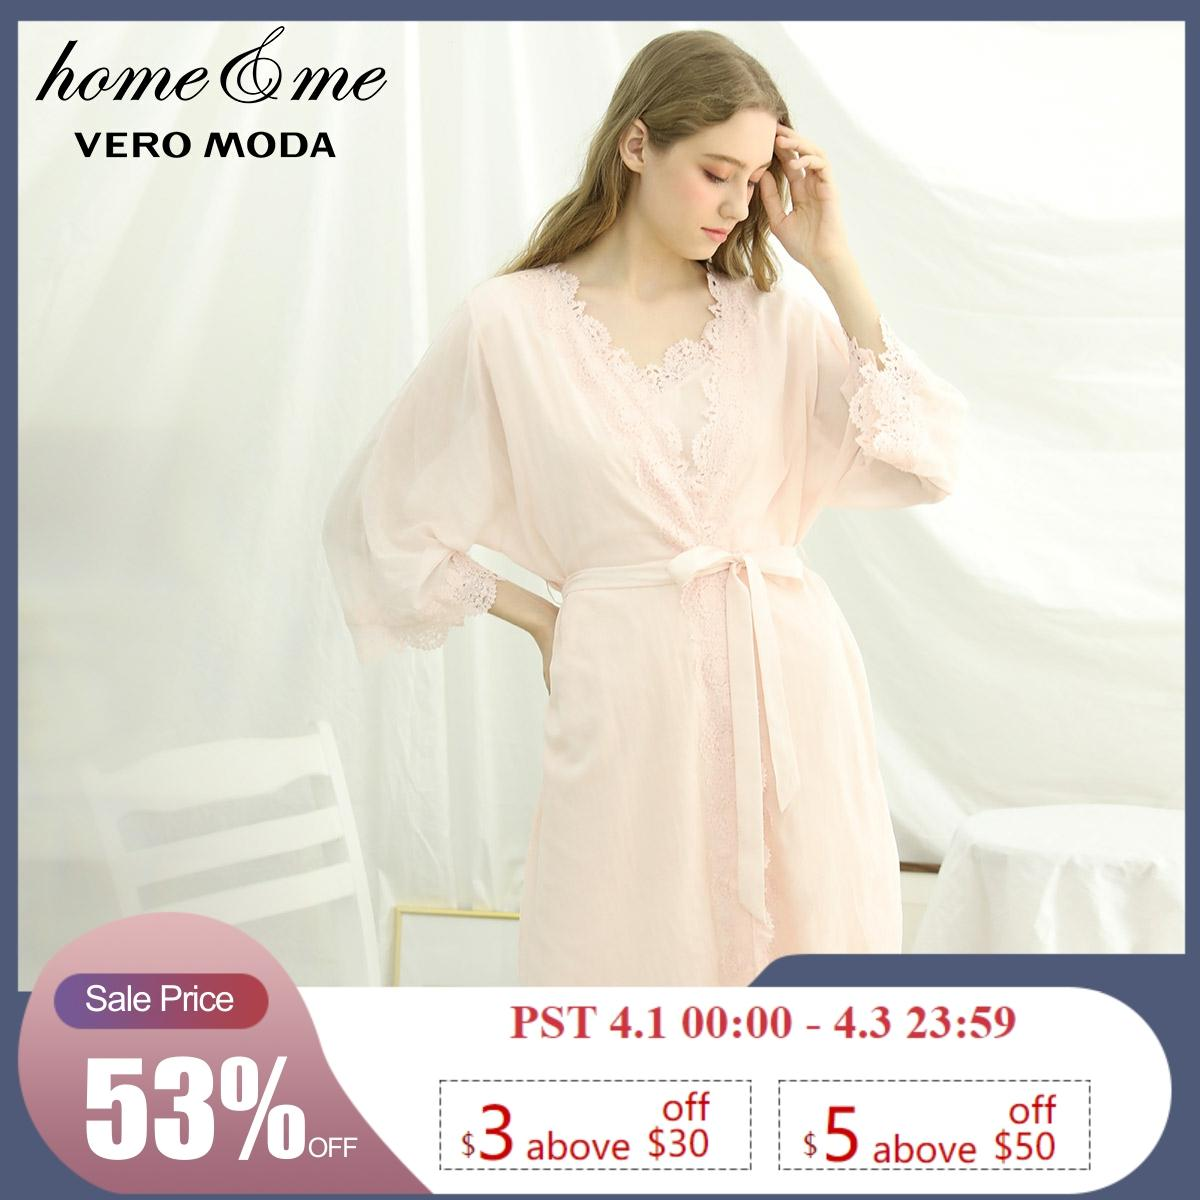 Vero Moda New Arrivals 100% Cotton Night Dress Homewear Dress | 3192R1507